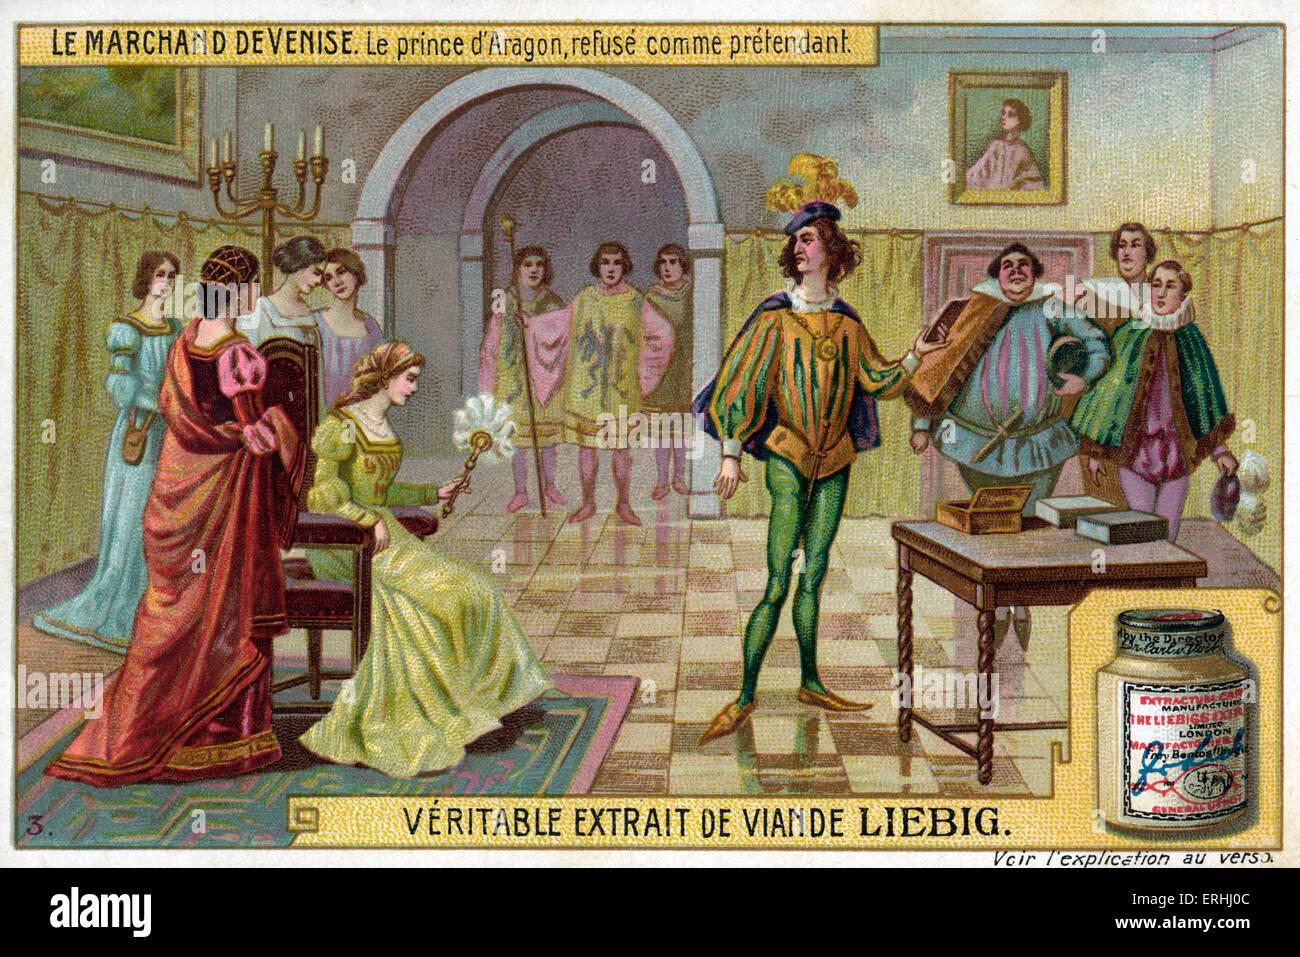 merchant of venice written by shakespeare